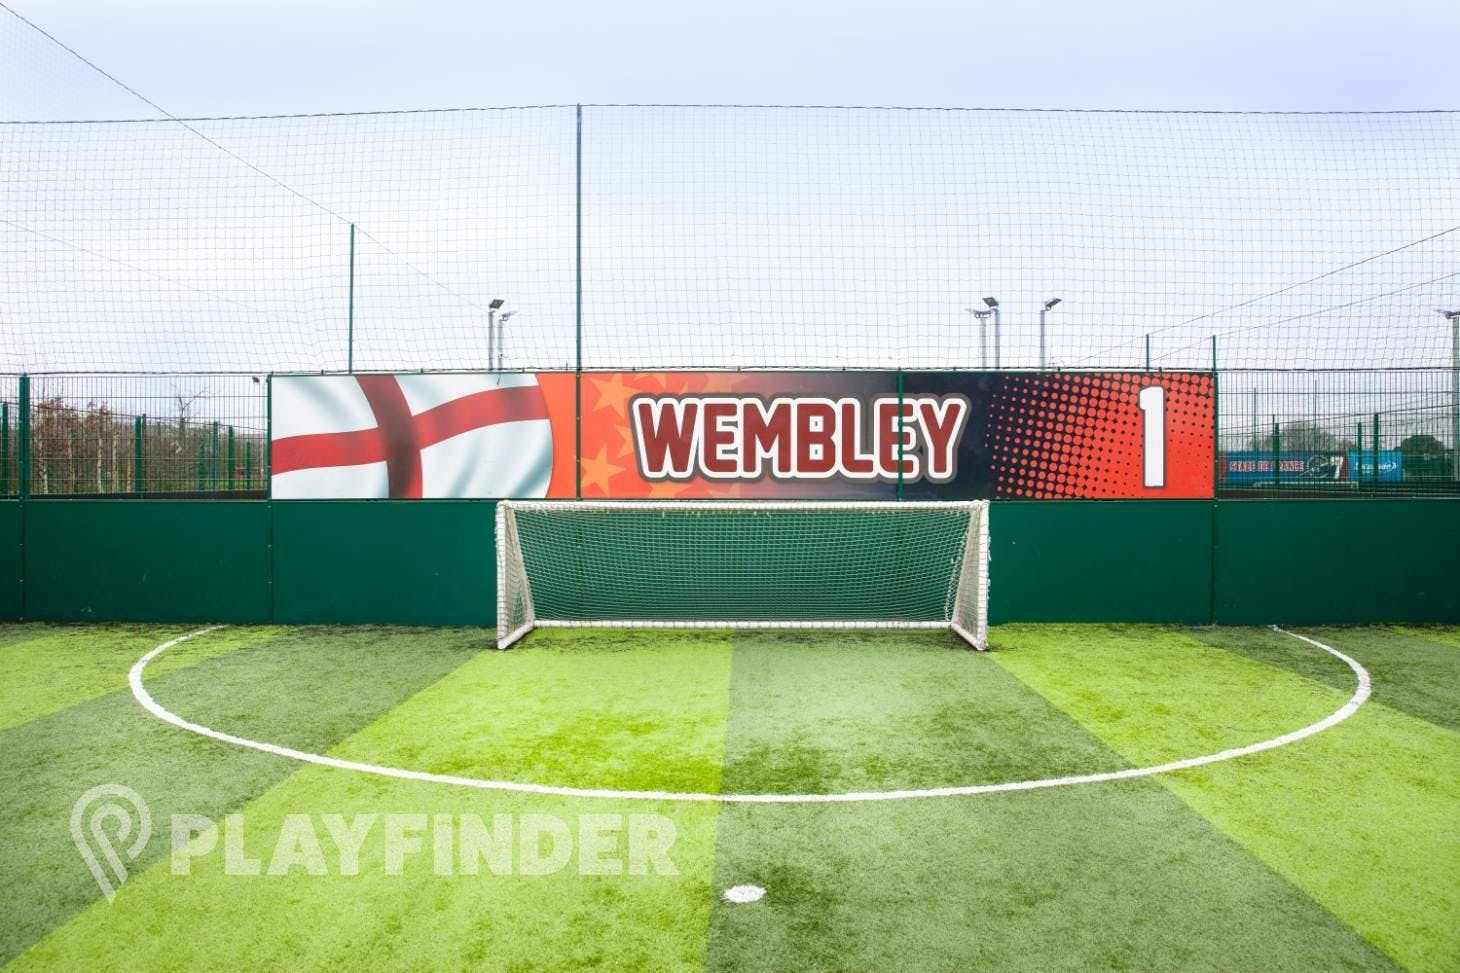 Goals Bristol North 5 a side | 3G Astroturf football pitch